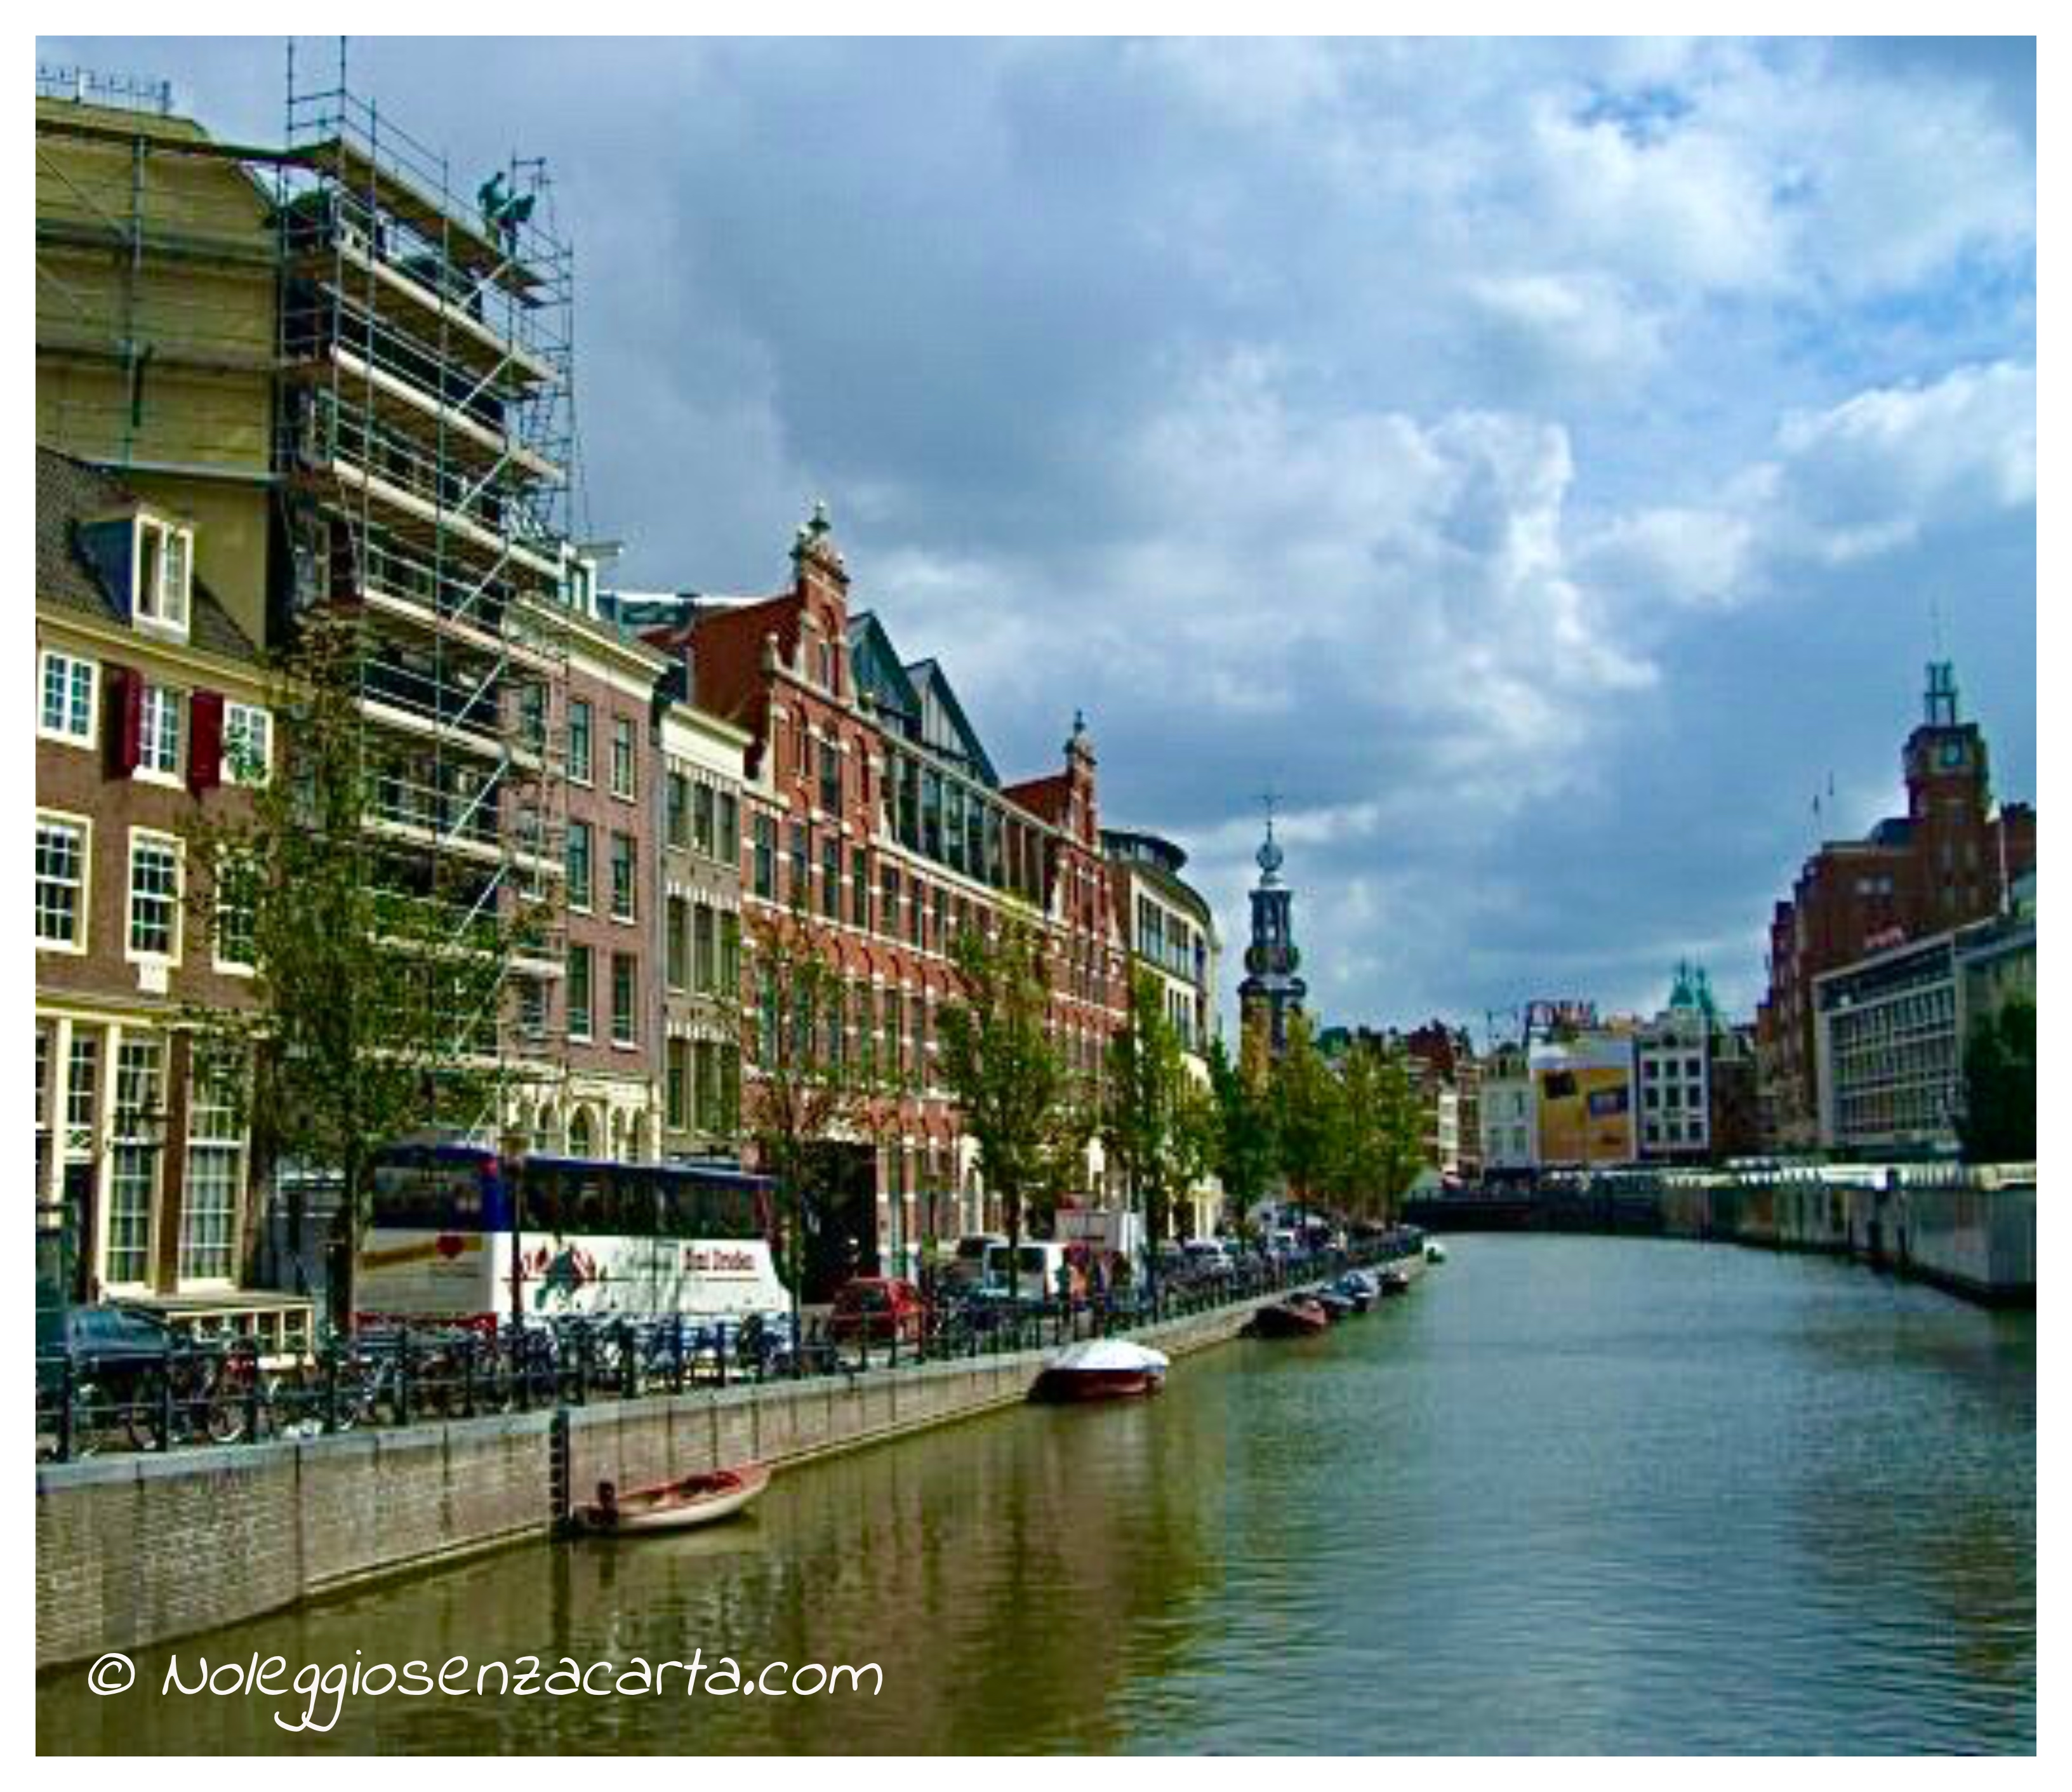 Alquiler coche Amsterdam sin tarjeta de crédito